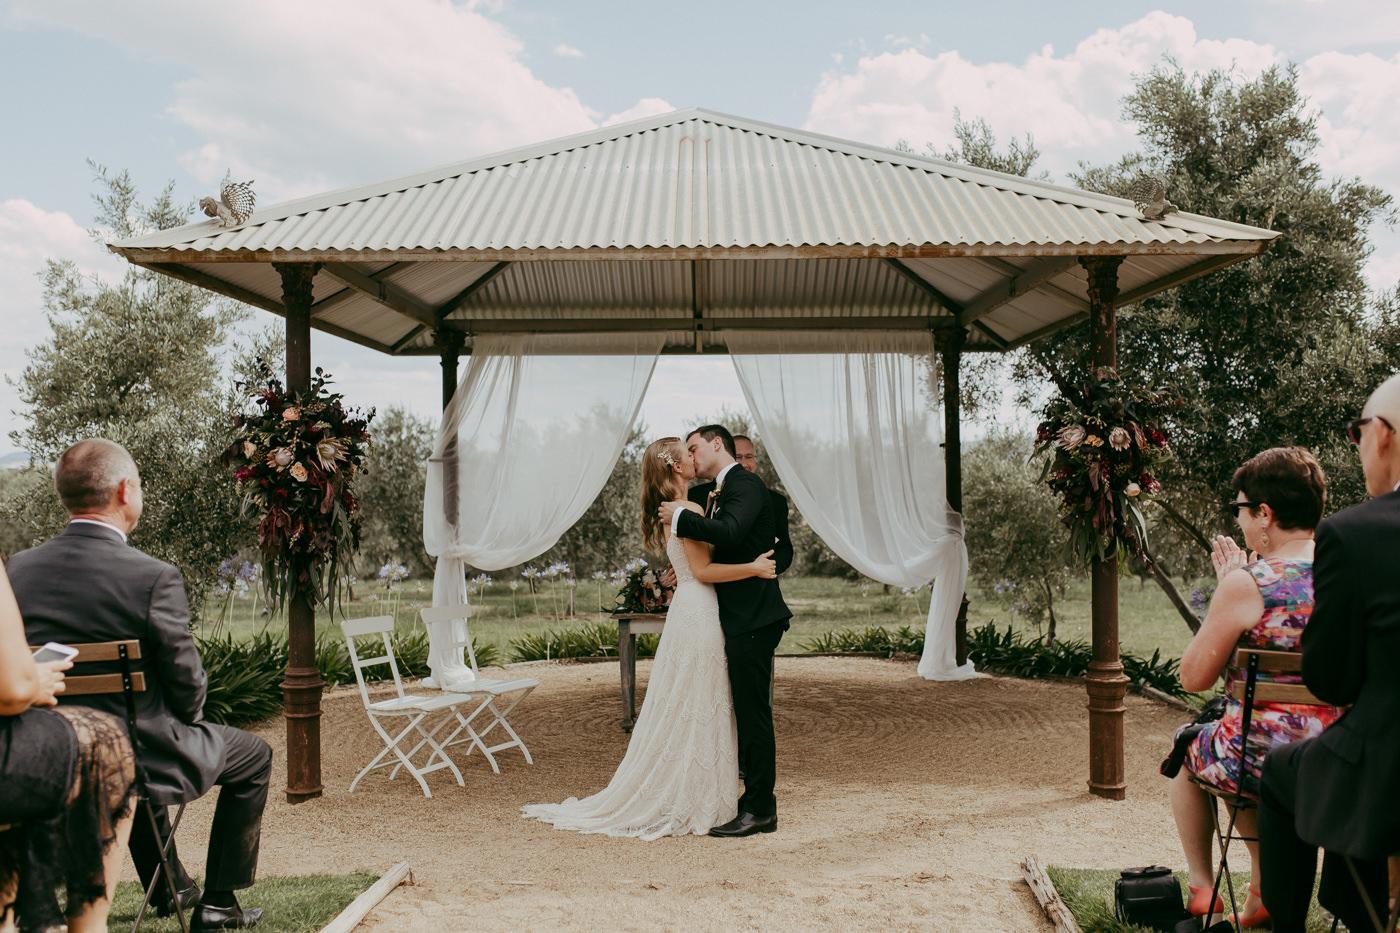 Anthony & Eliet - Wagga Wagga Wedding - Country NSW - Samantha Heather Photography-108.jpg